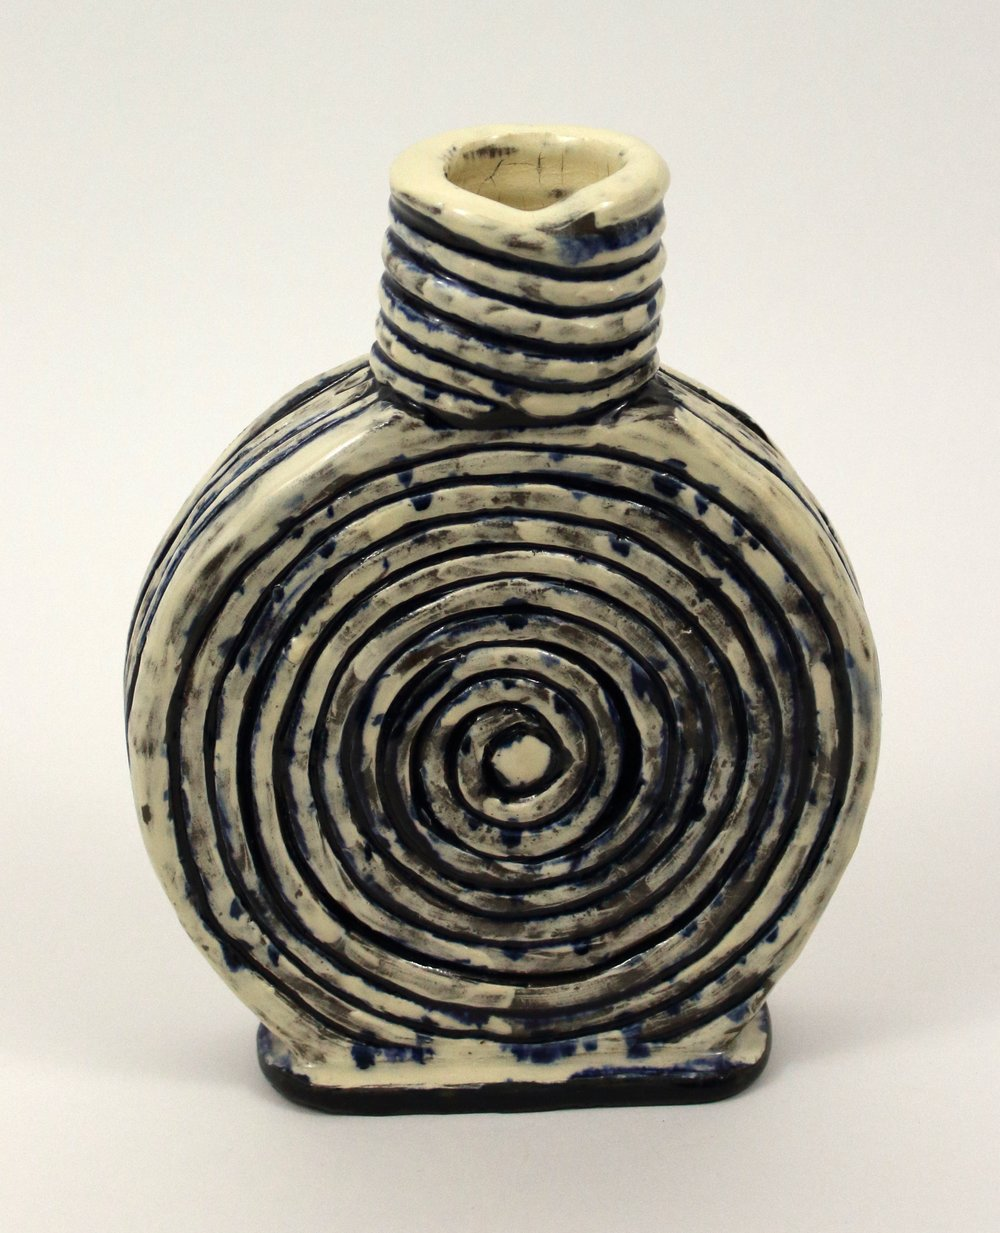 "Small Vase   Stoneware, slip, wash, and glaze  8"" x 6 1/2"" x 1 1/2""  $120  Click image to enlarge   Inquire."